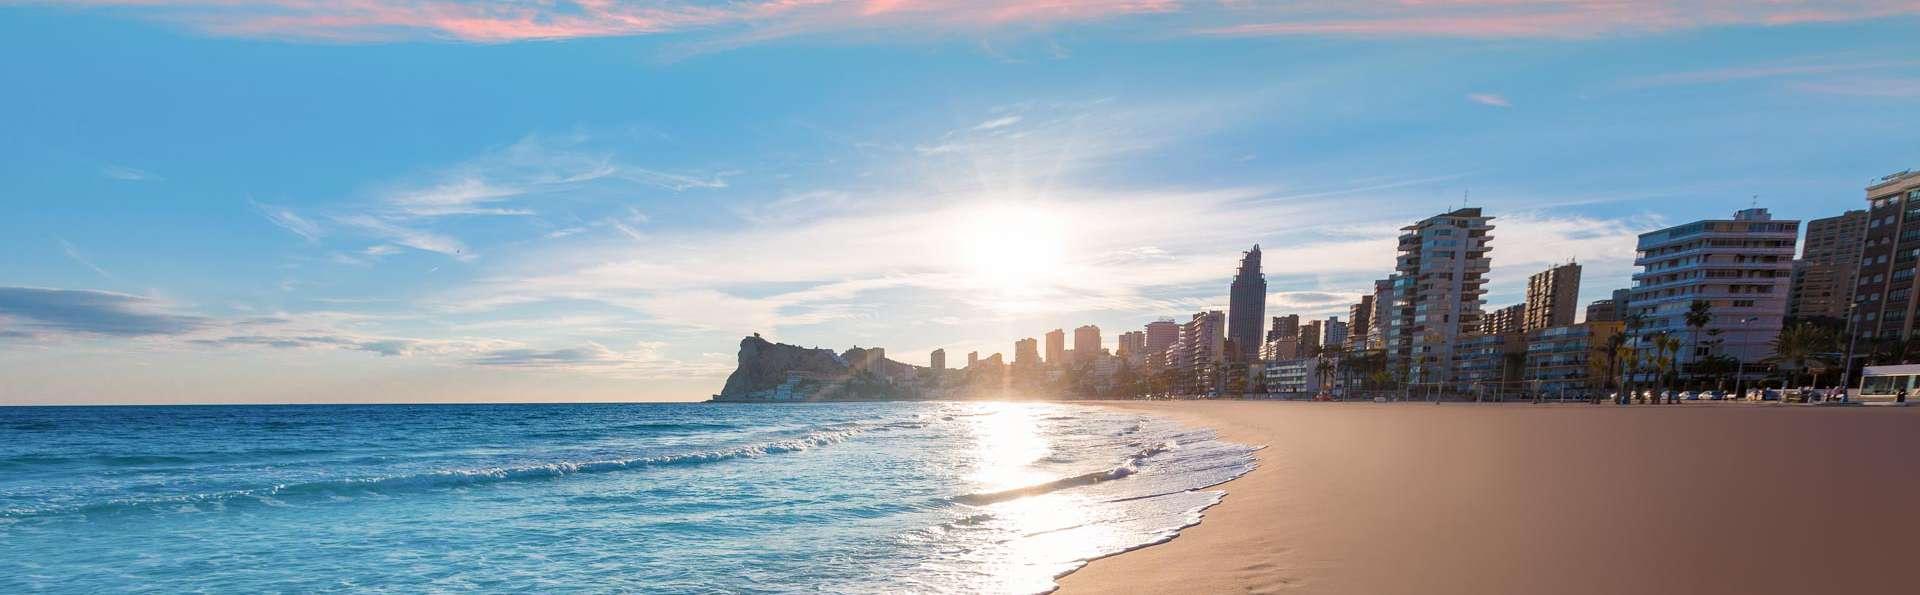 Hotel Poseidon Playa - EDIT_BENIDORM_10.jpg